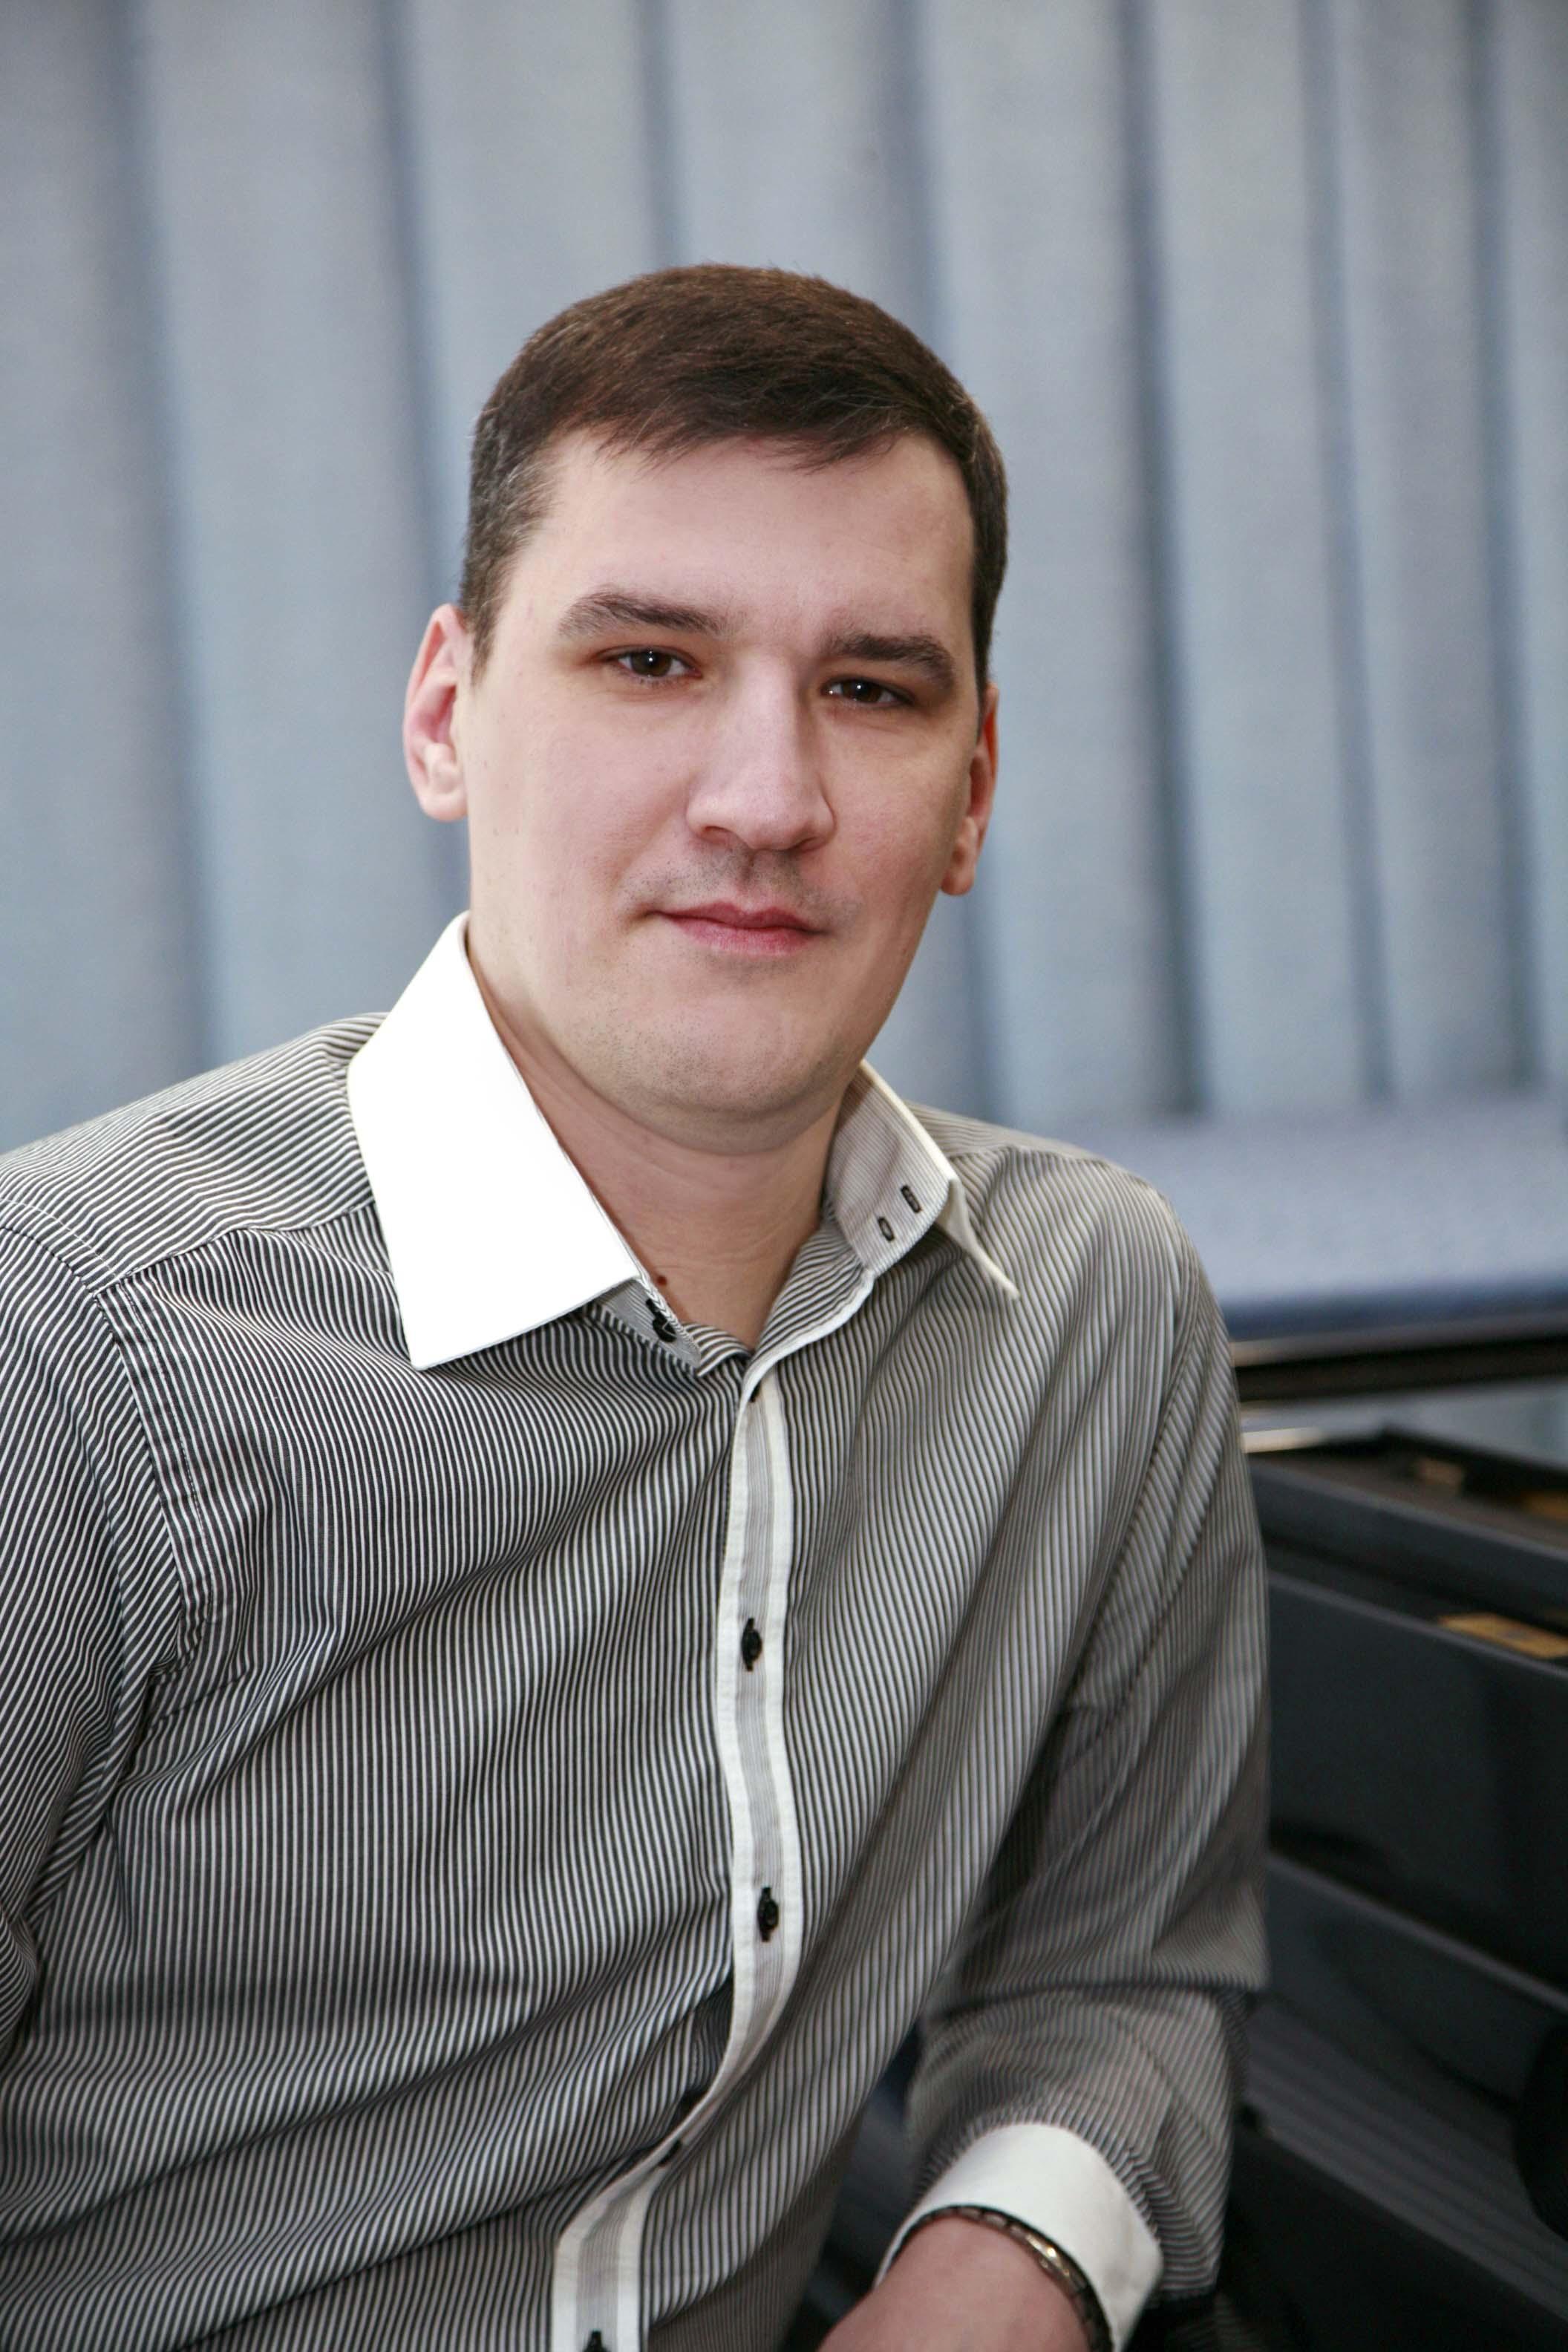 Побоев Кирилл Юрьевич